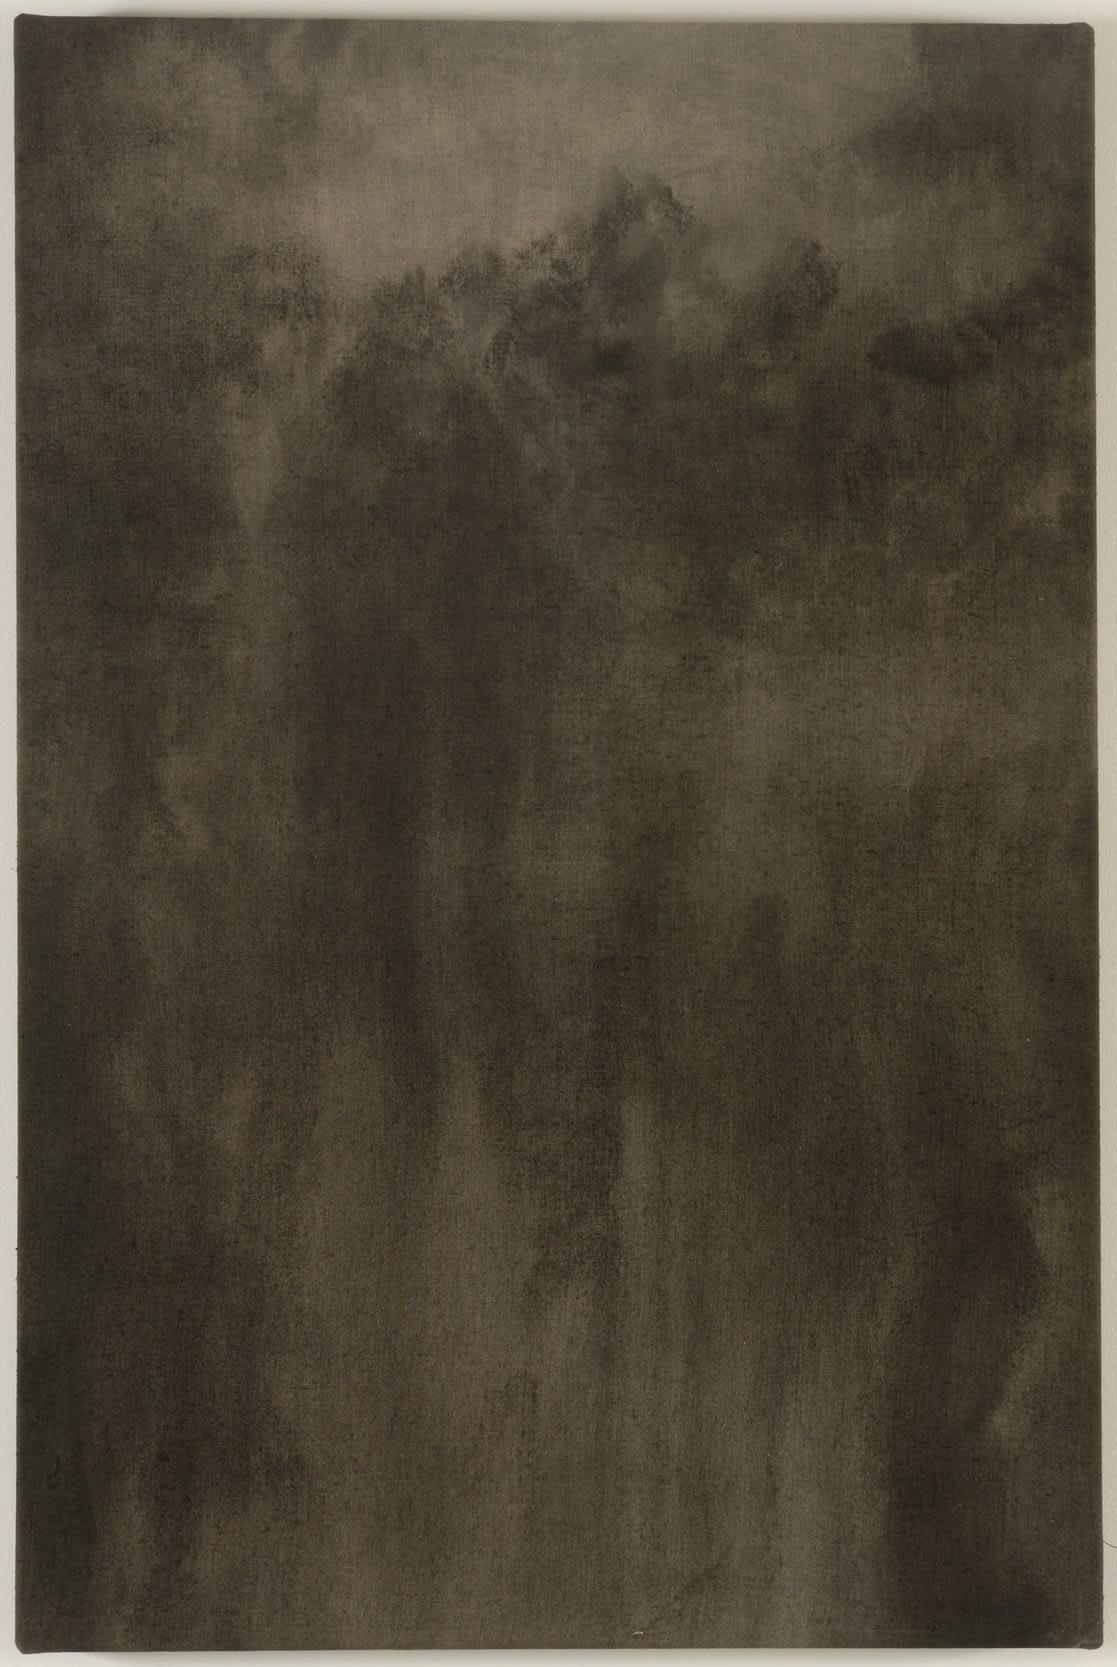 Michael Biberstein Sem título Acrilíco s/ linho 91 x 61 x 5 cm